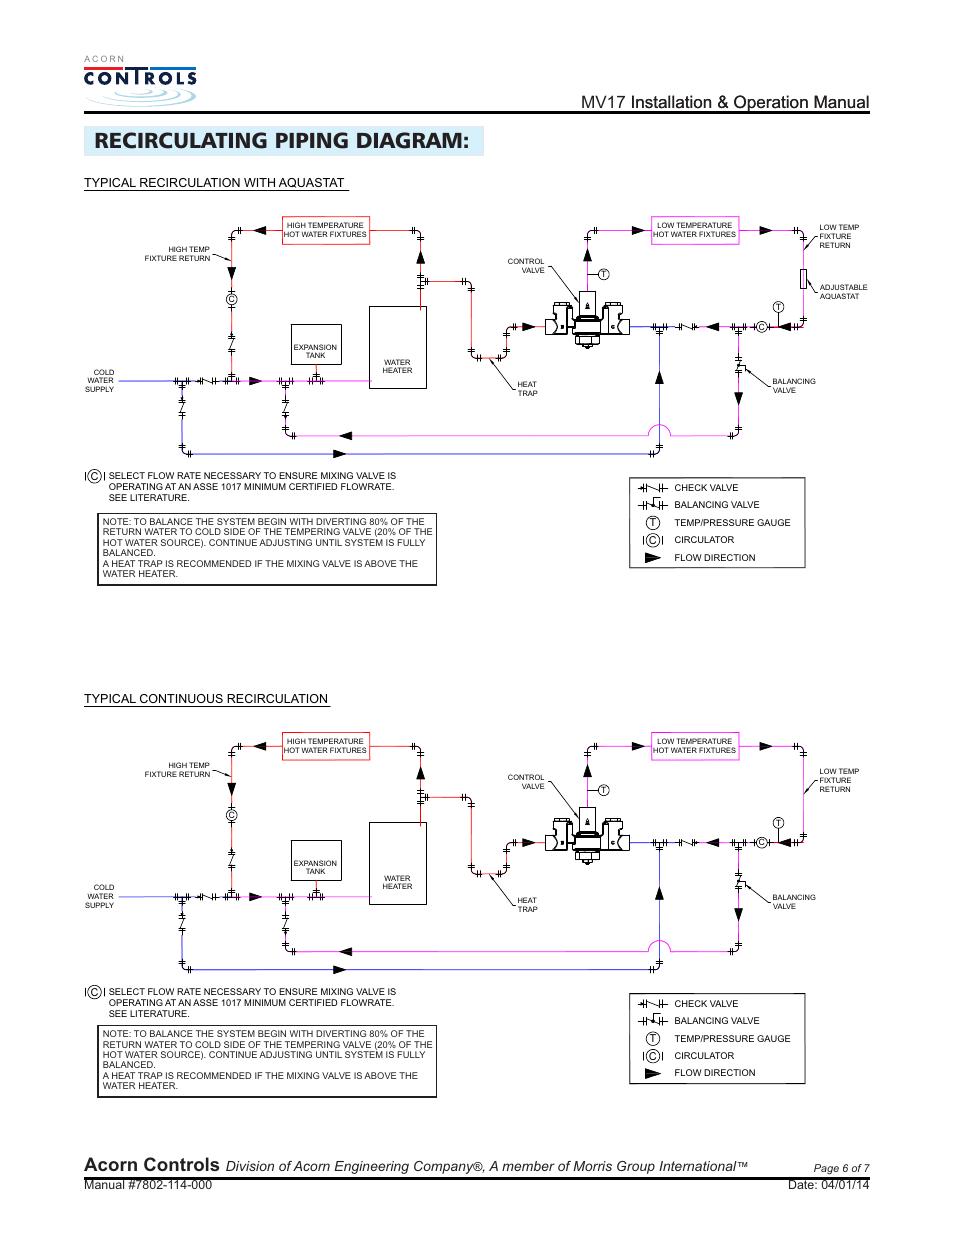 Recirculating piping diagram, Acorn controls, Installation & operation  manual | Mv17 installation & operation